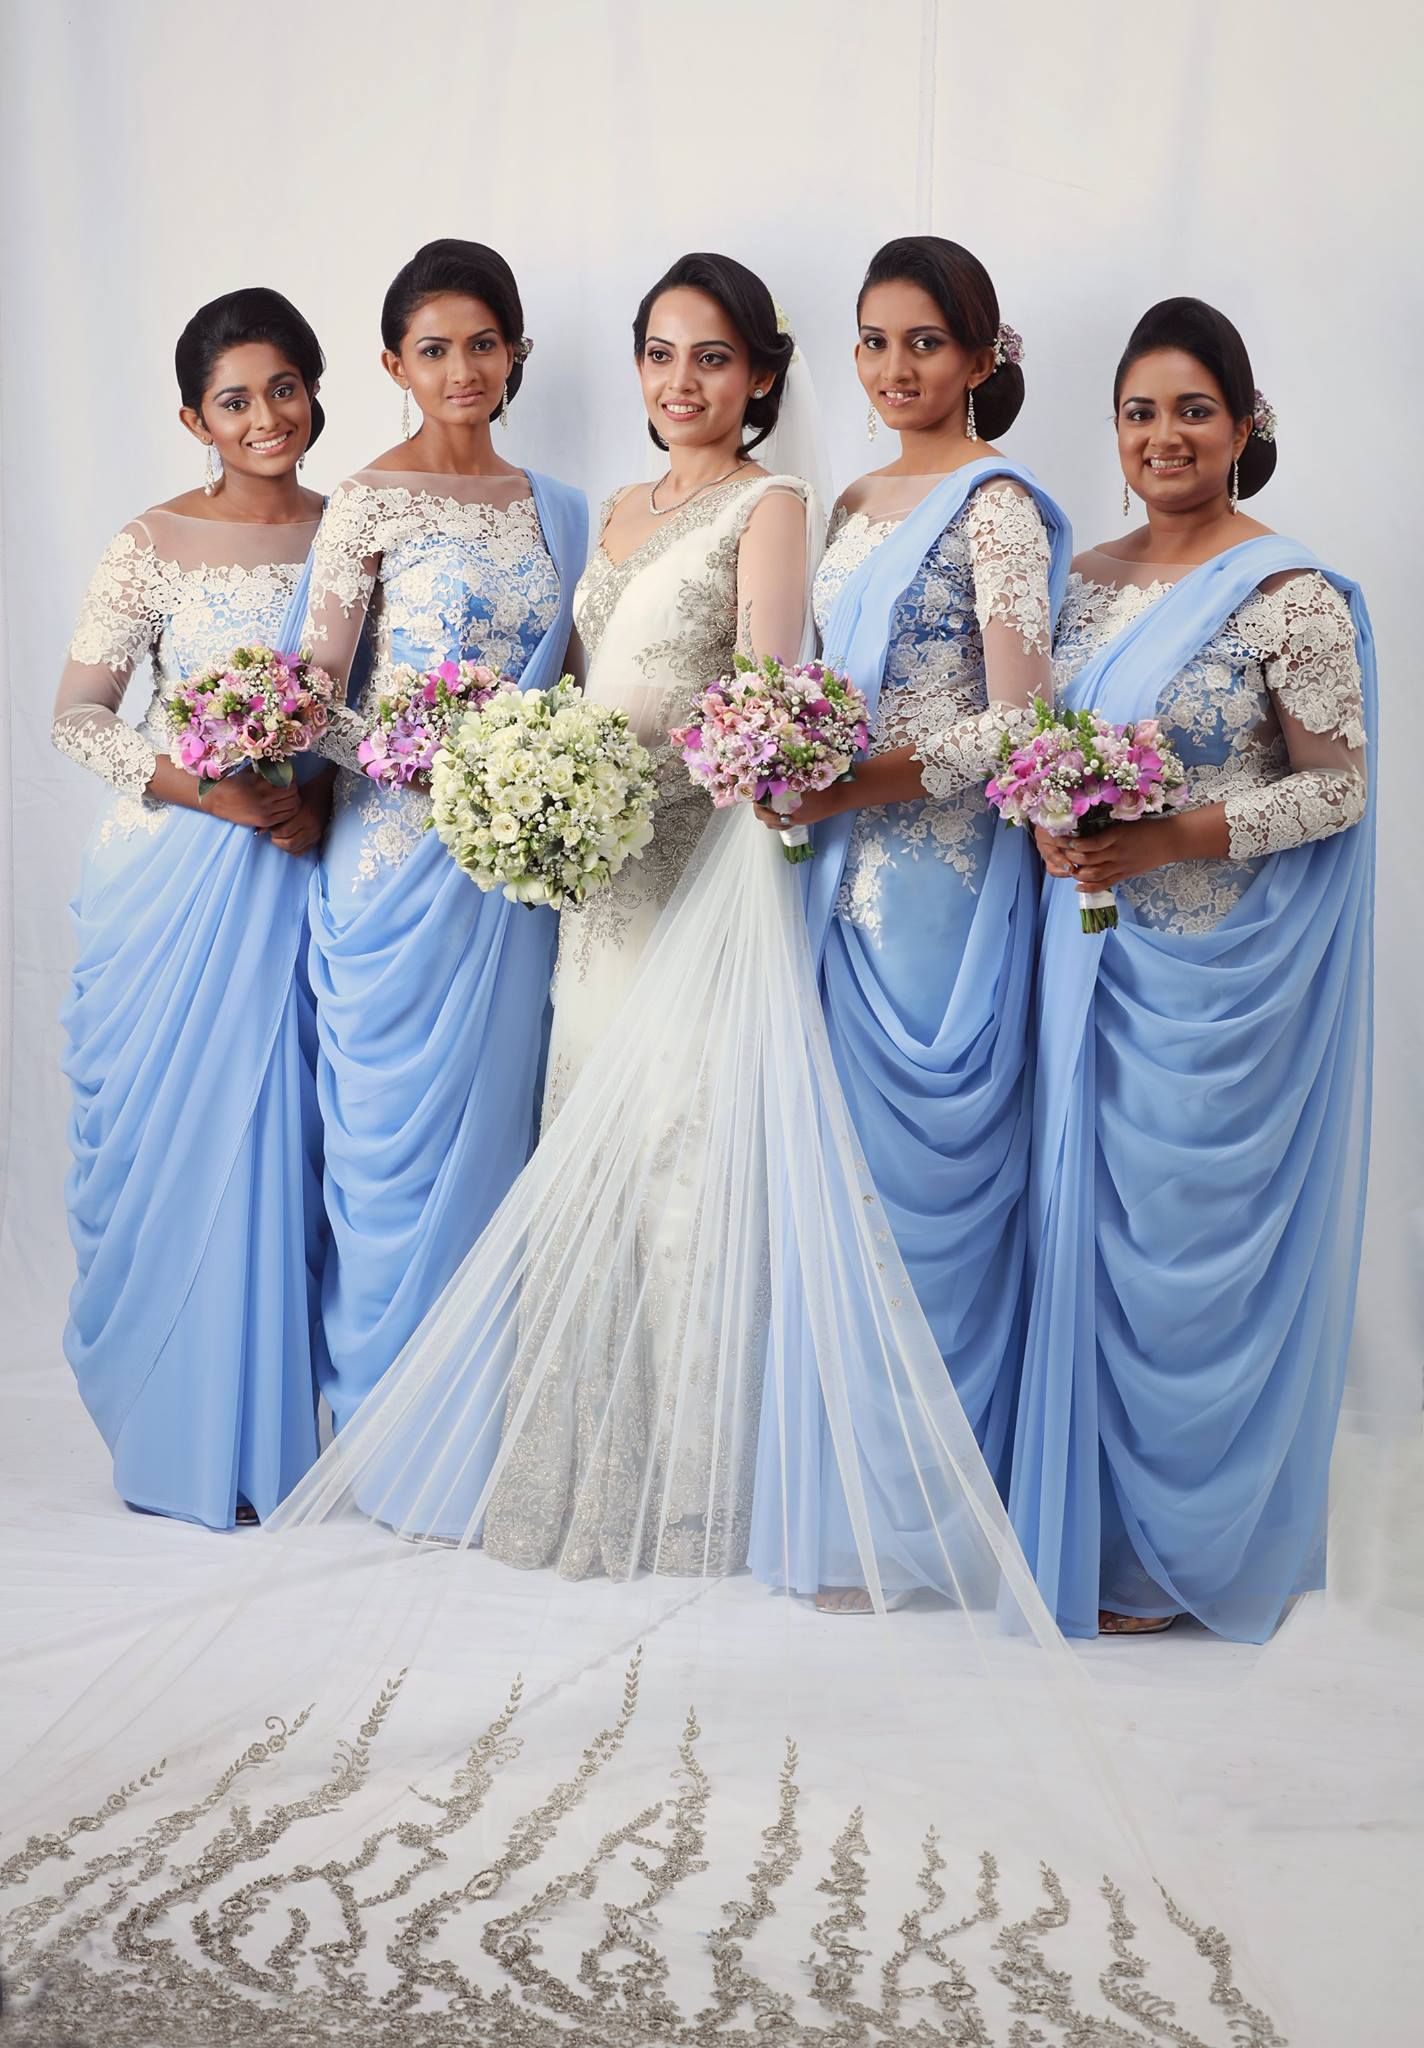 HAIR ,MAKEUP & DRESSING Indika Bandara OF INBA | Sri Lankan Weddings ...